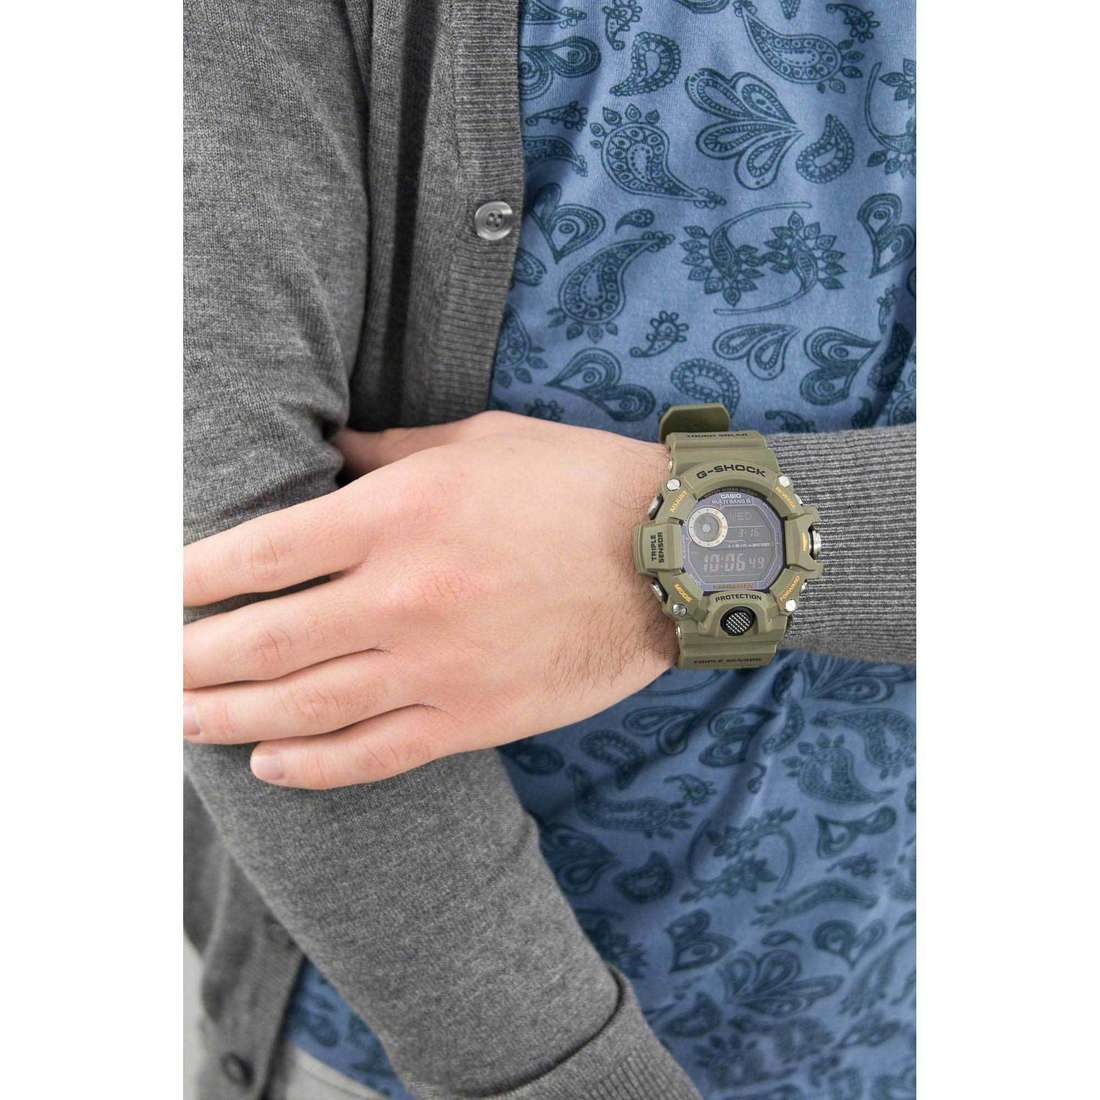 Casio digitali G-Shock uomo GW-9400-3ER indosso